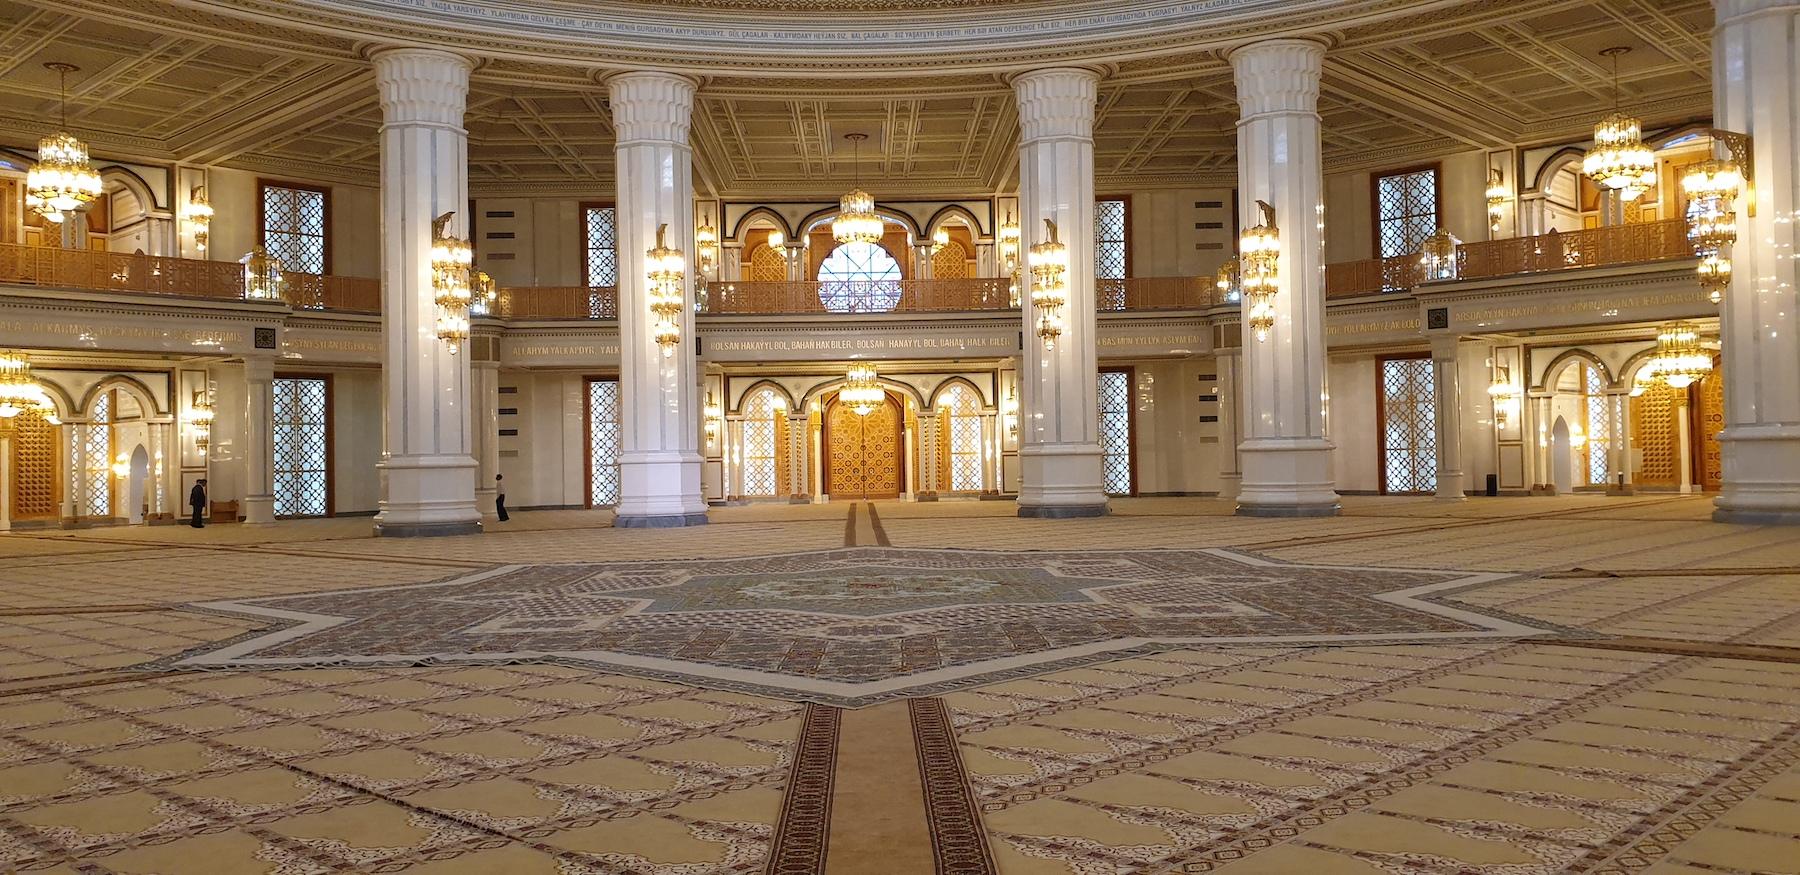 Turkmenbashi Ruhy Moskeen